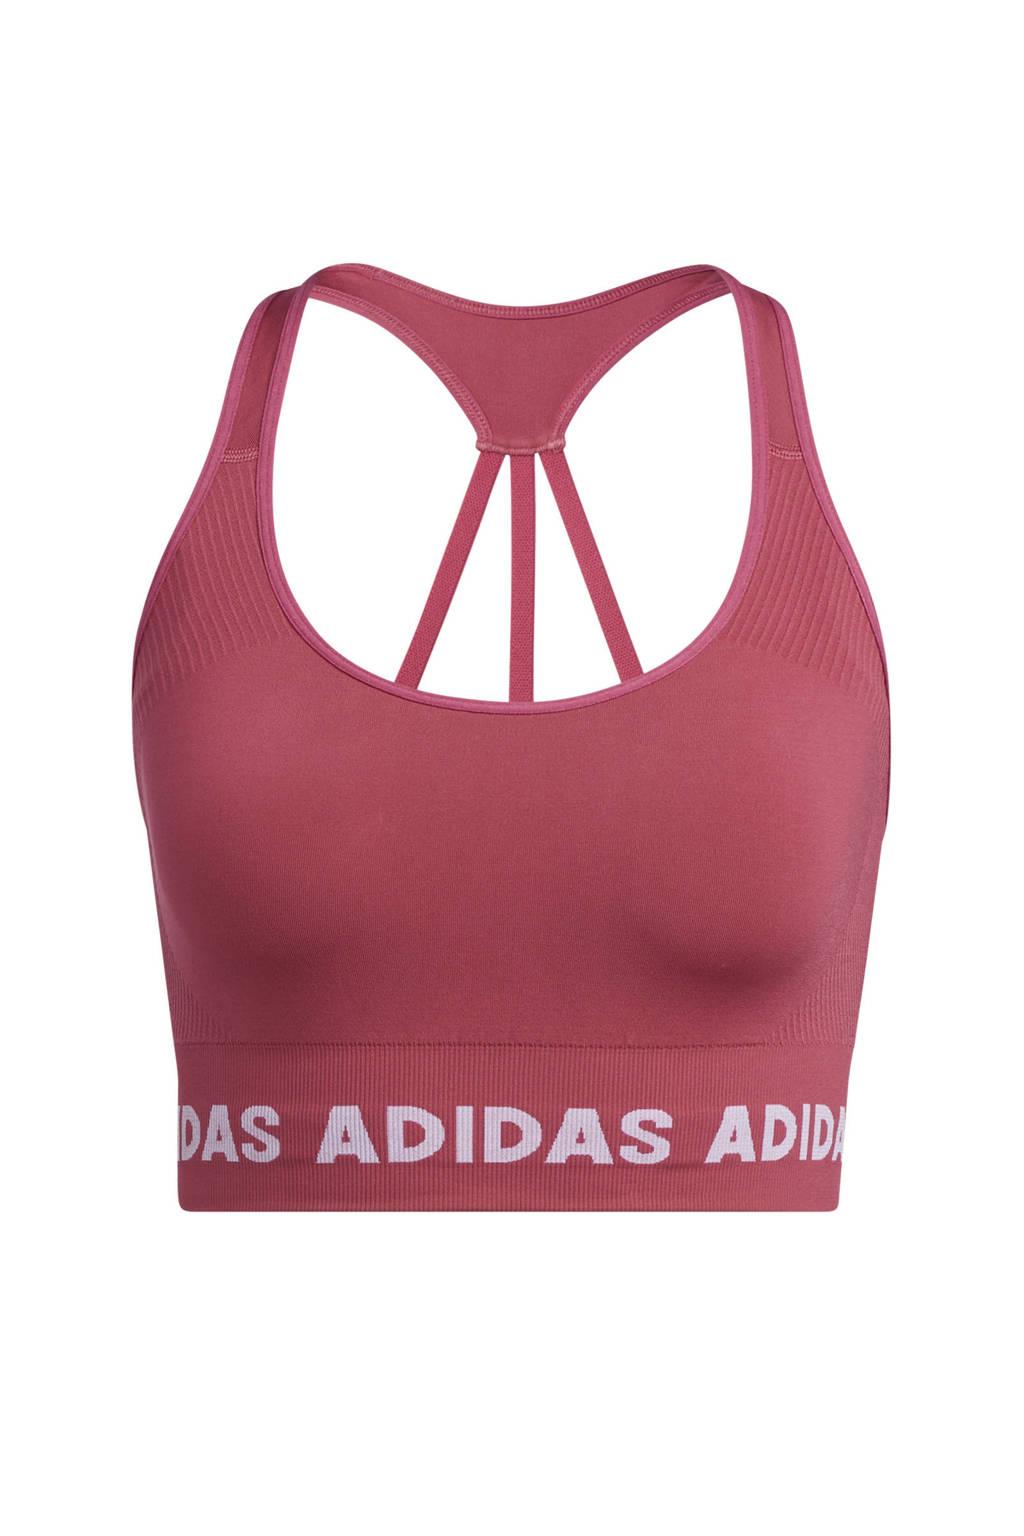 adidas Performance level 2 Aeroknit sportBH roze, Roze